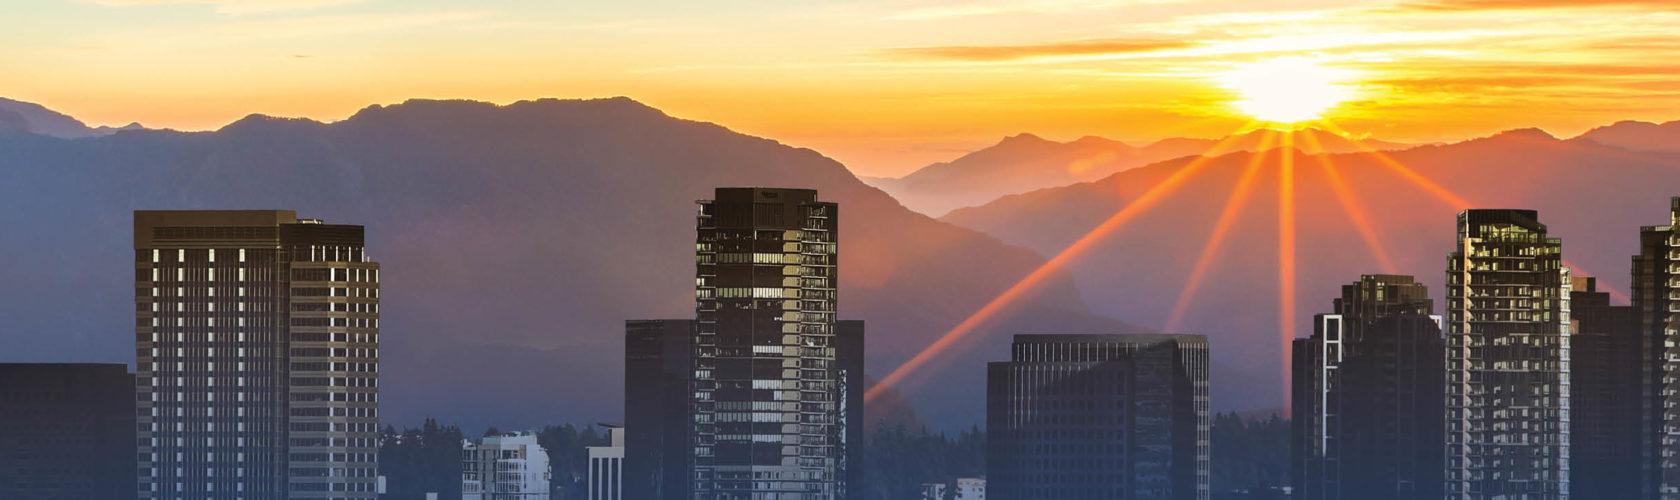 sun rising over Seattle skyline